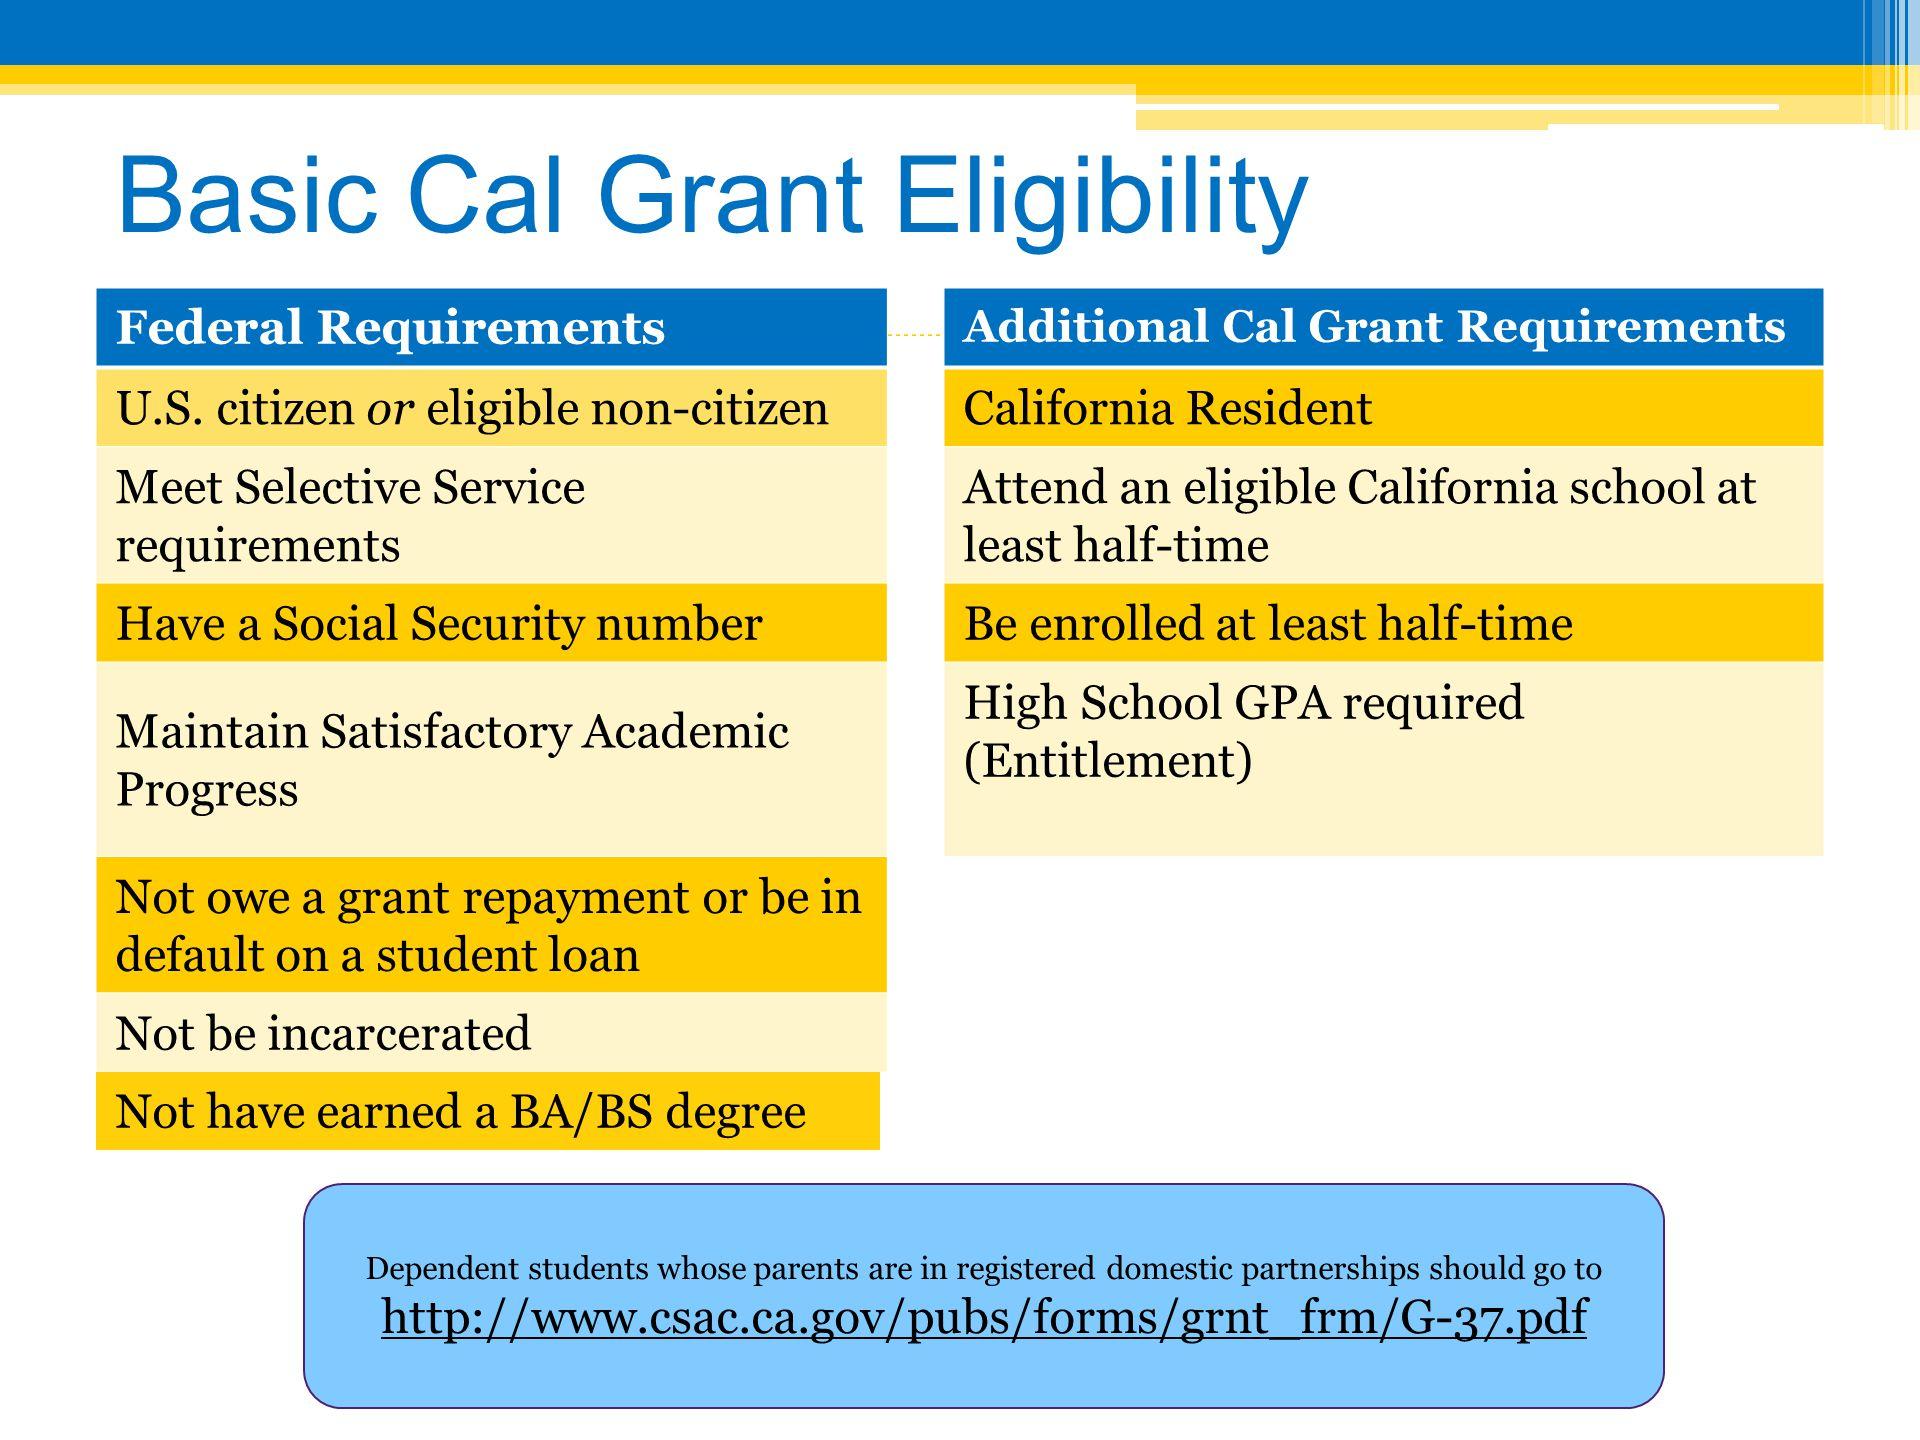 Basic Cal Grant Eligibility